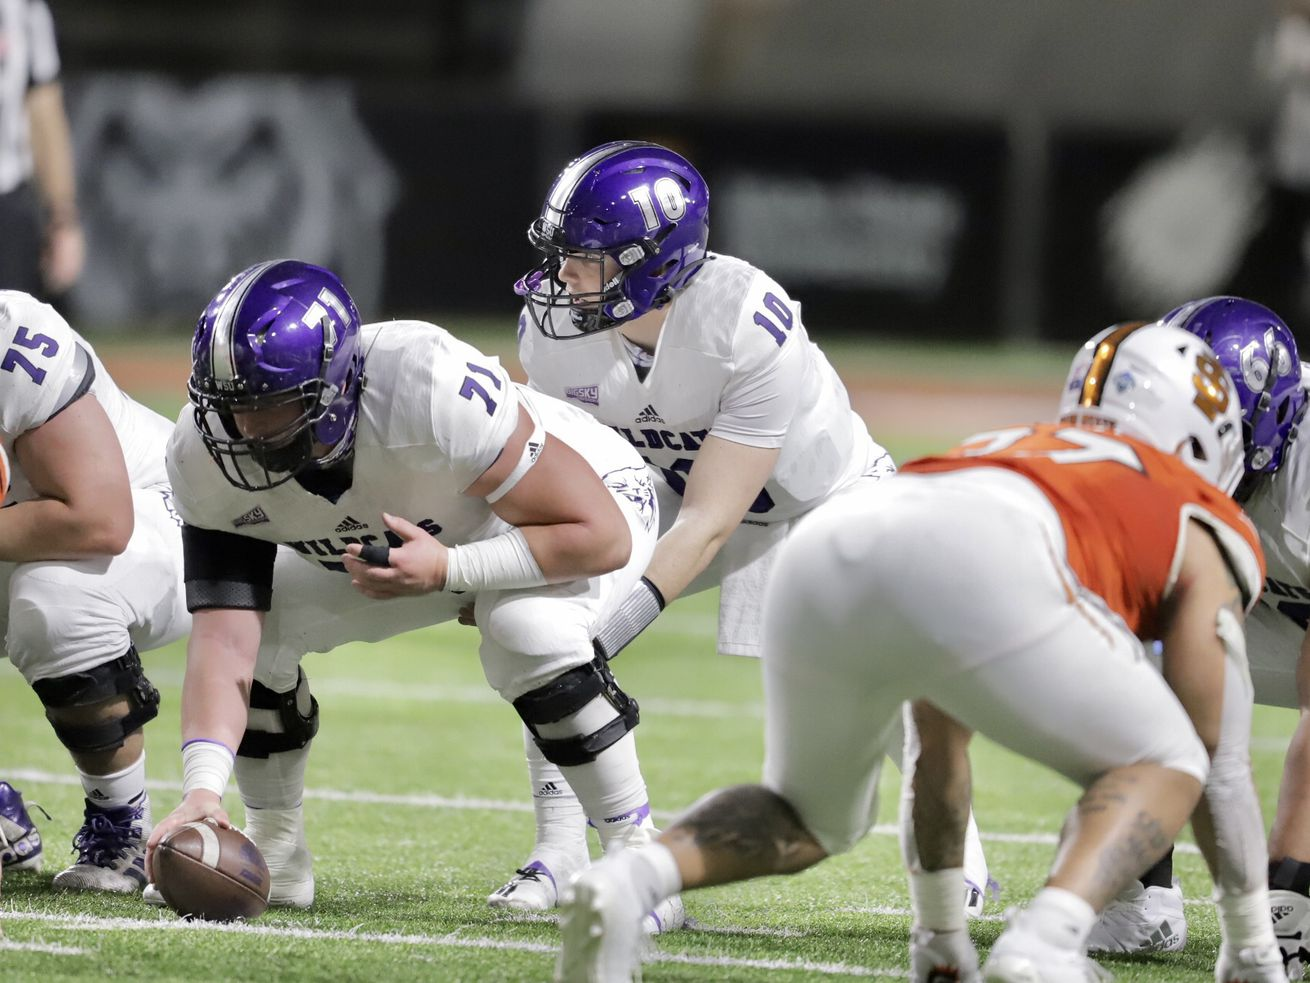 Bronson Barron shines in debut, Weber State beats Idaho State 49-21